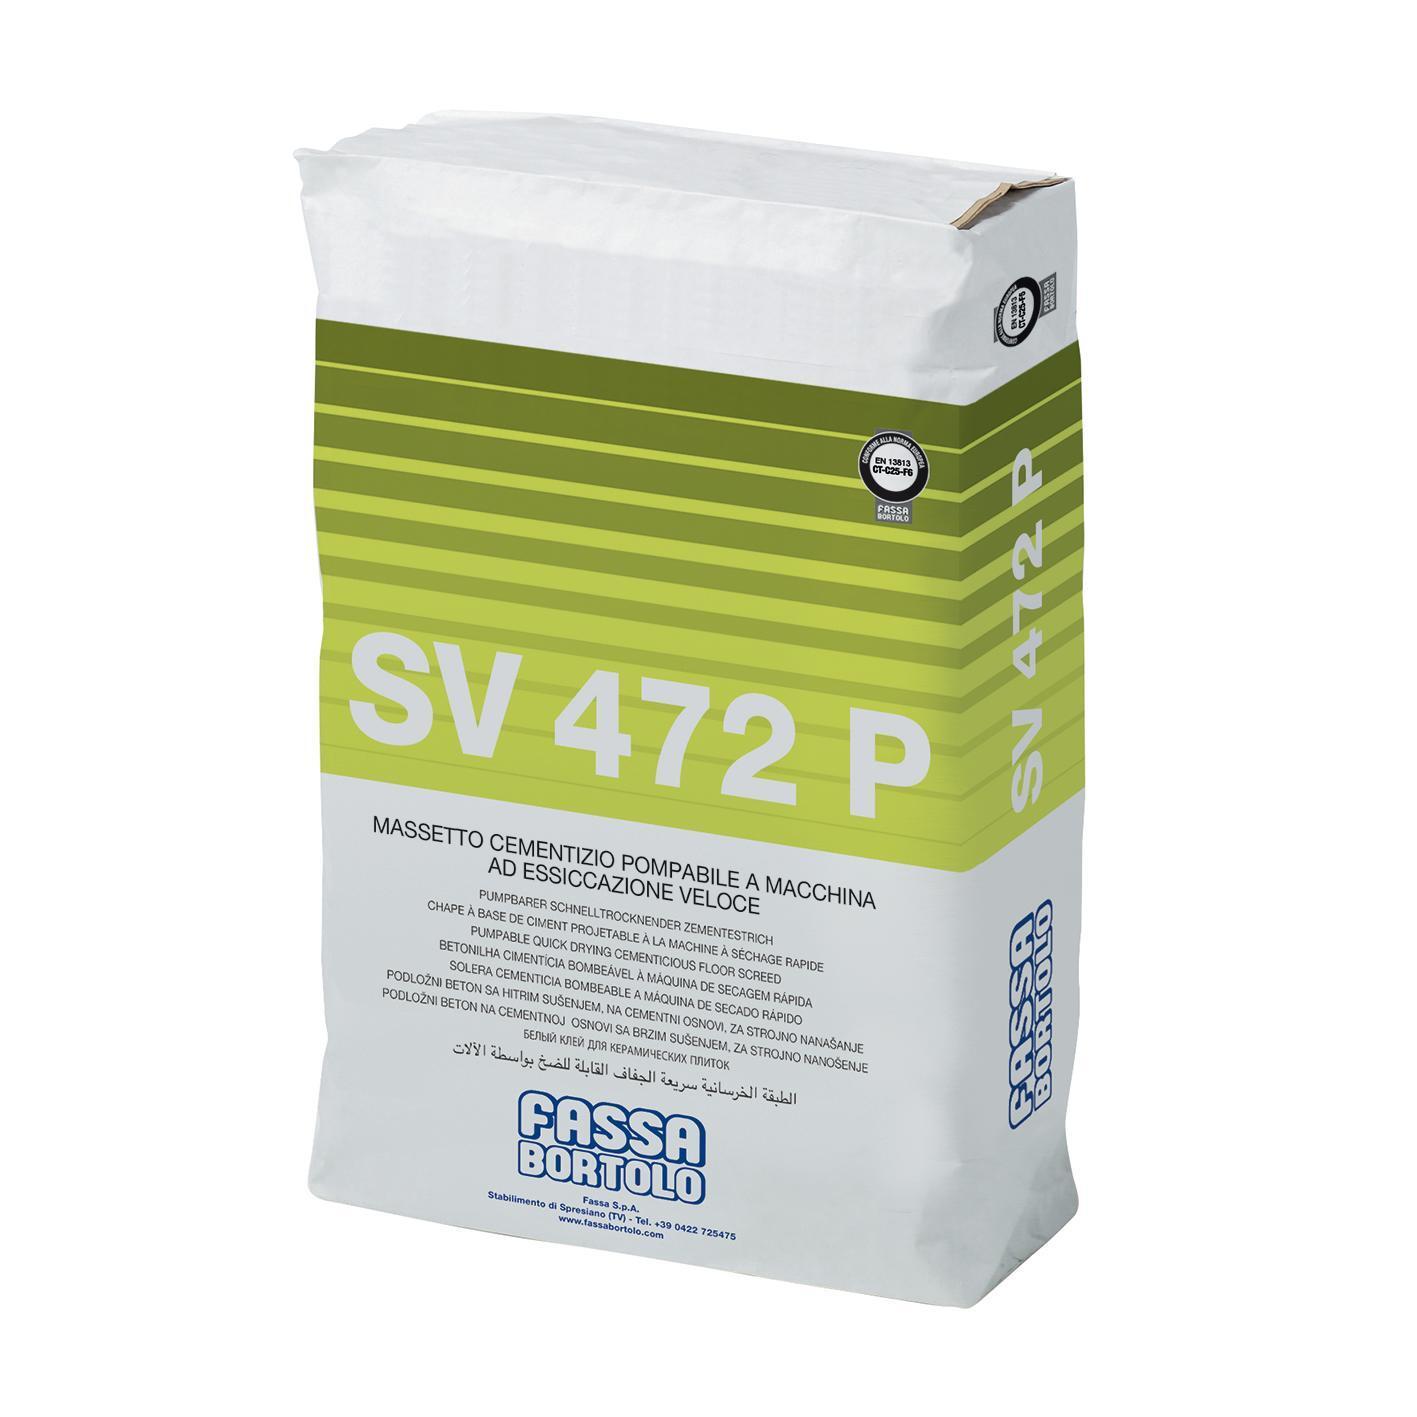 Massetto FASSA BORTOLO SV472P 25 kg - 3